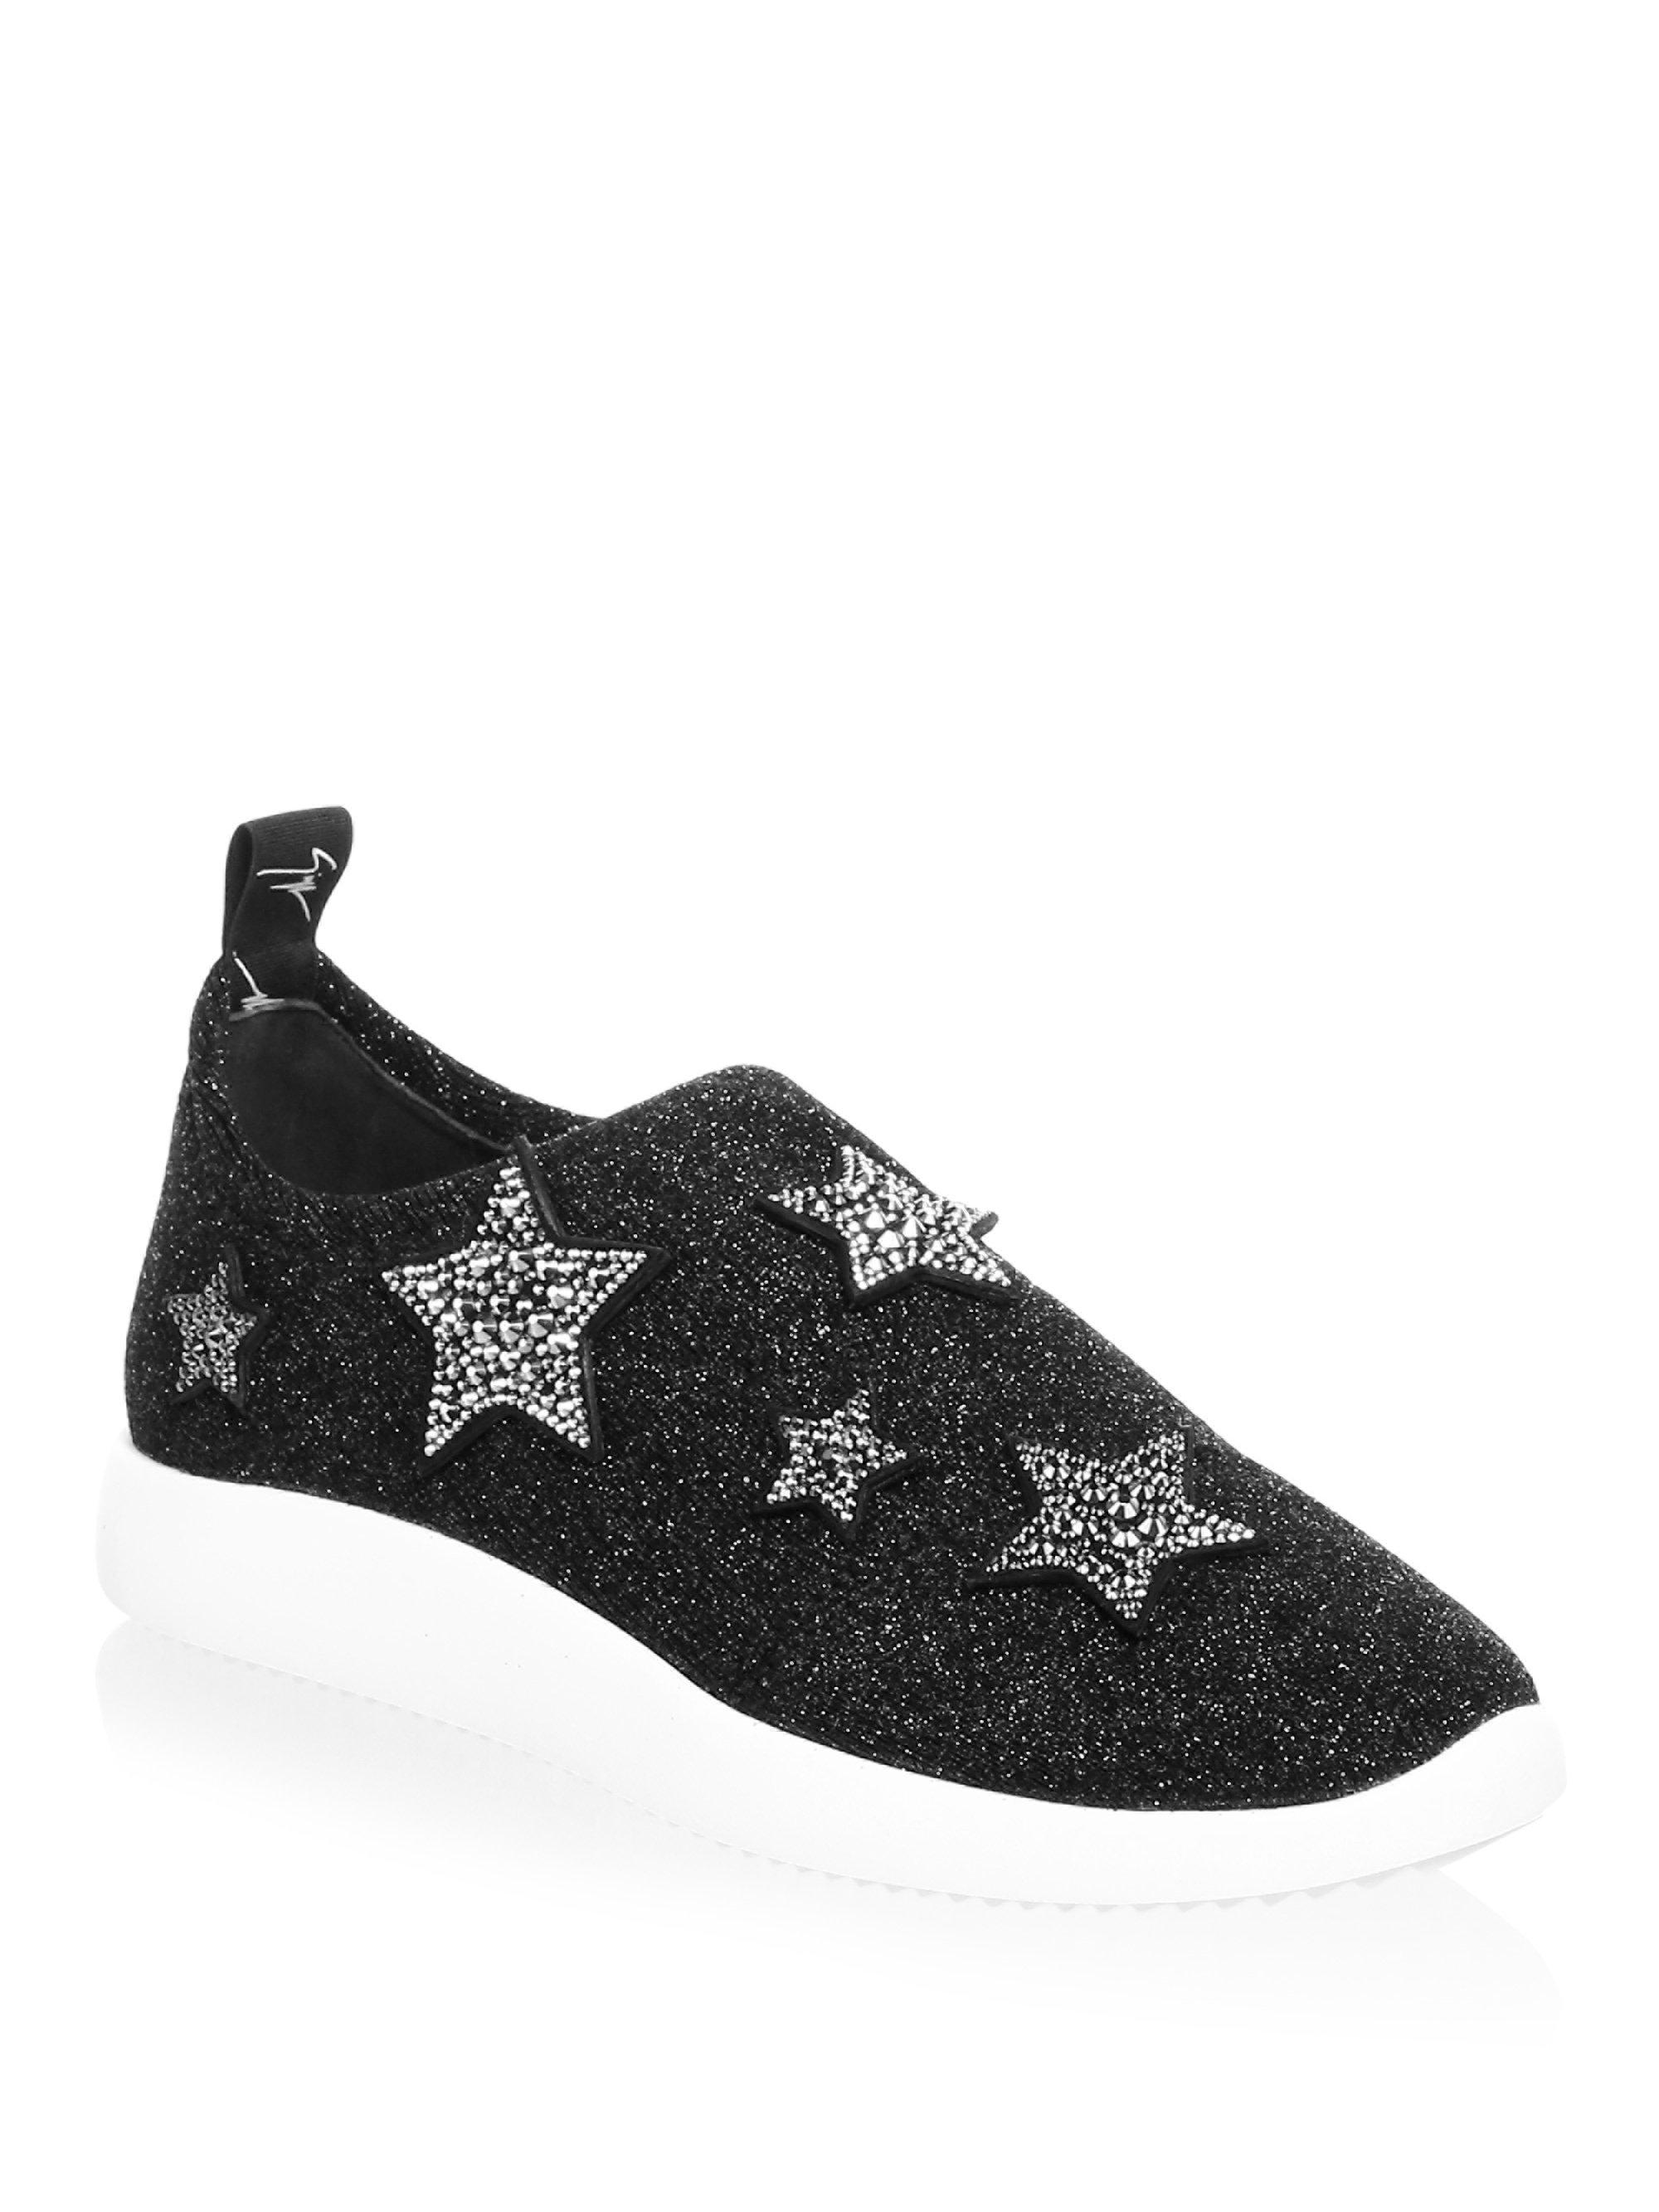 Giuseppe Zanotti Singles GSC Sneakers dN4fuj